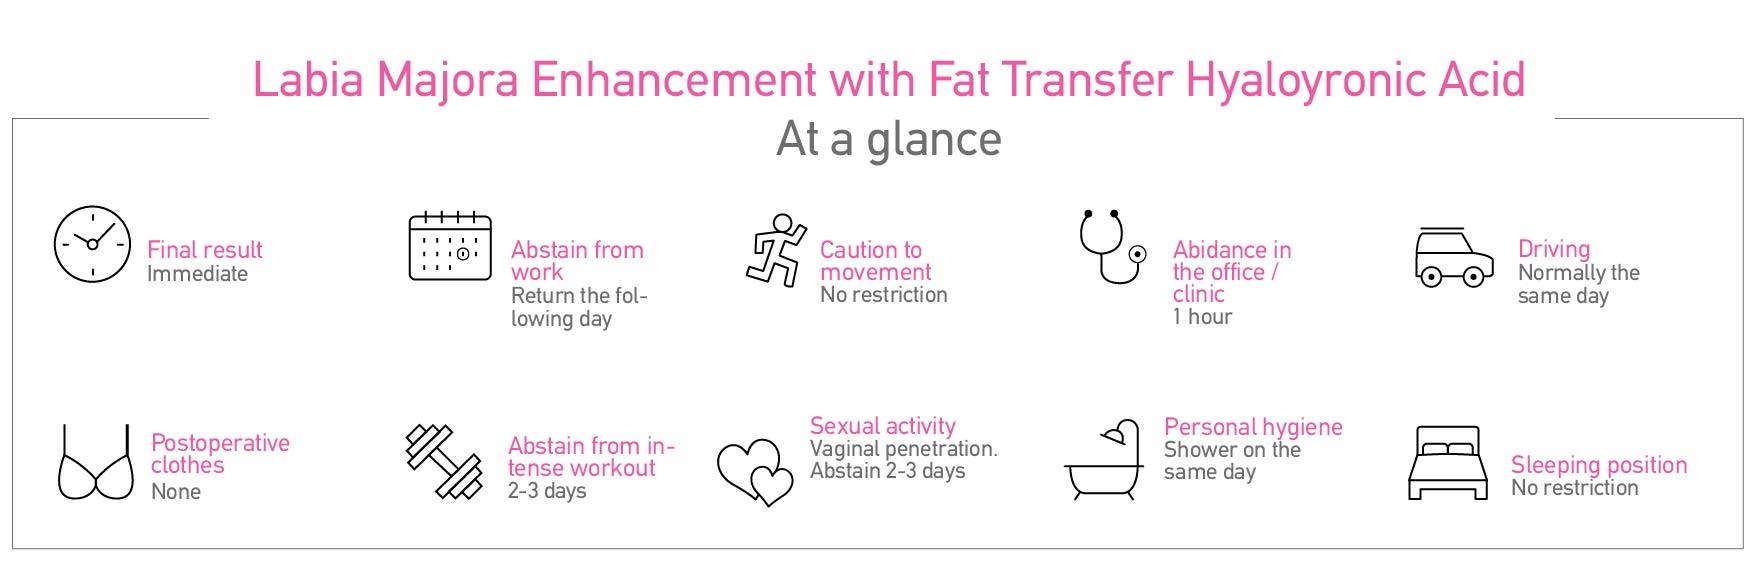 Labia Majora Enhancement with Fat transfer / Hyaluronic Acid